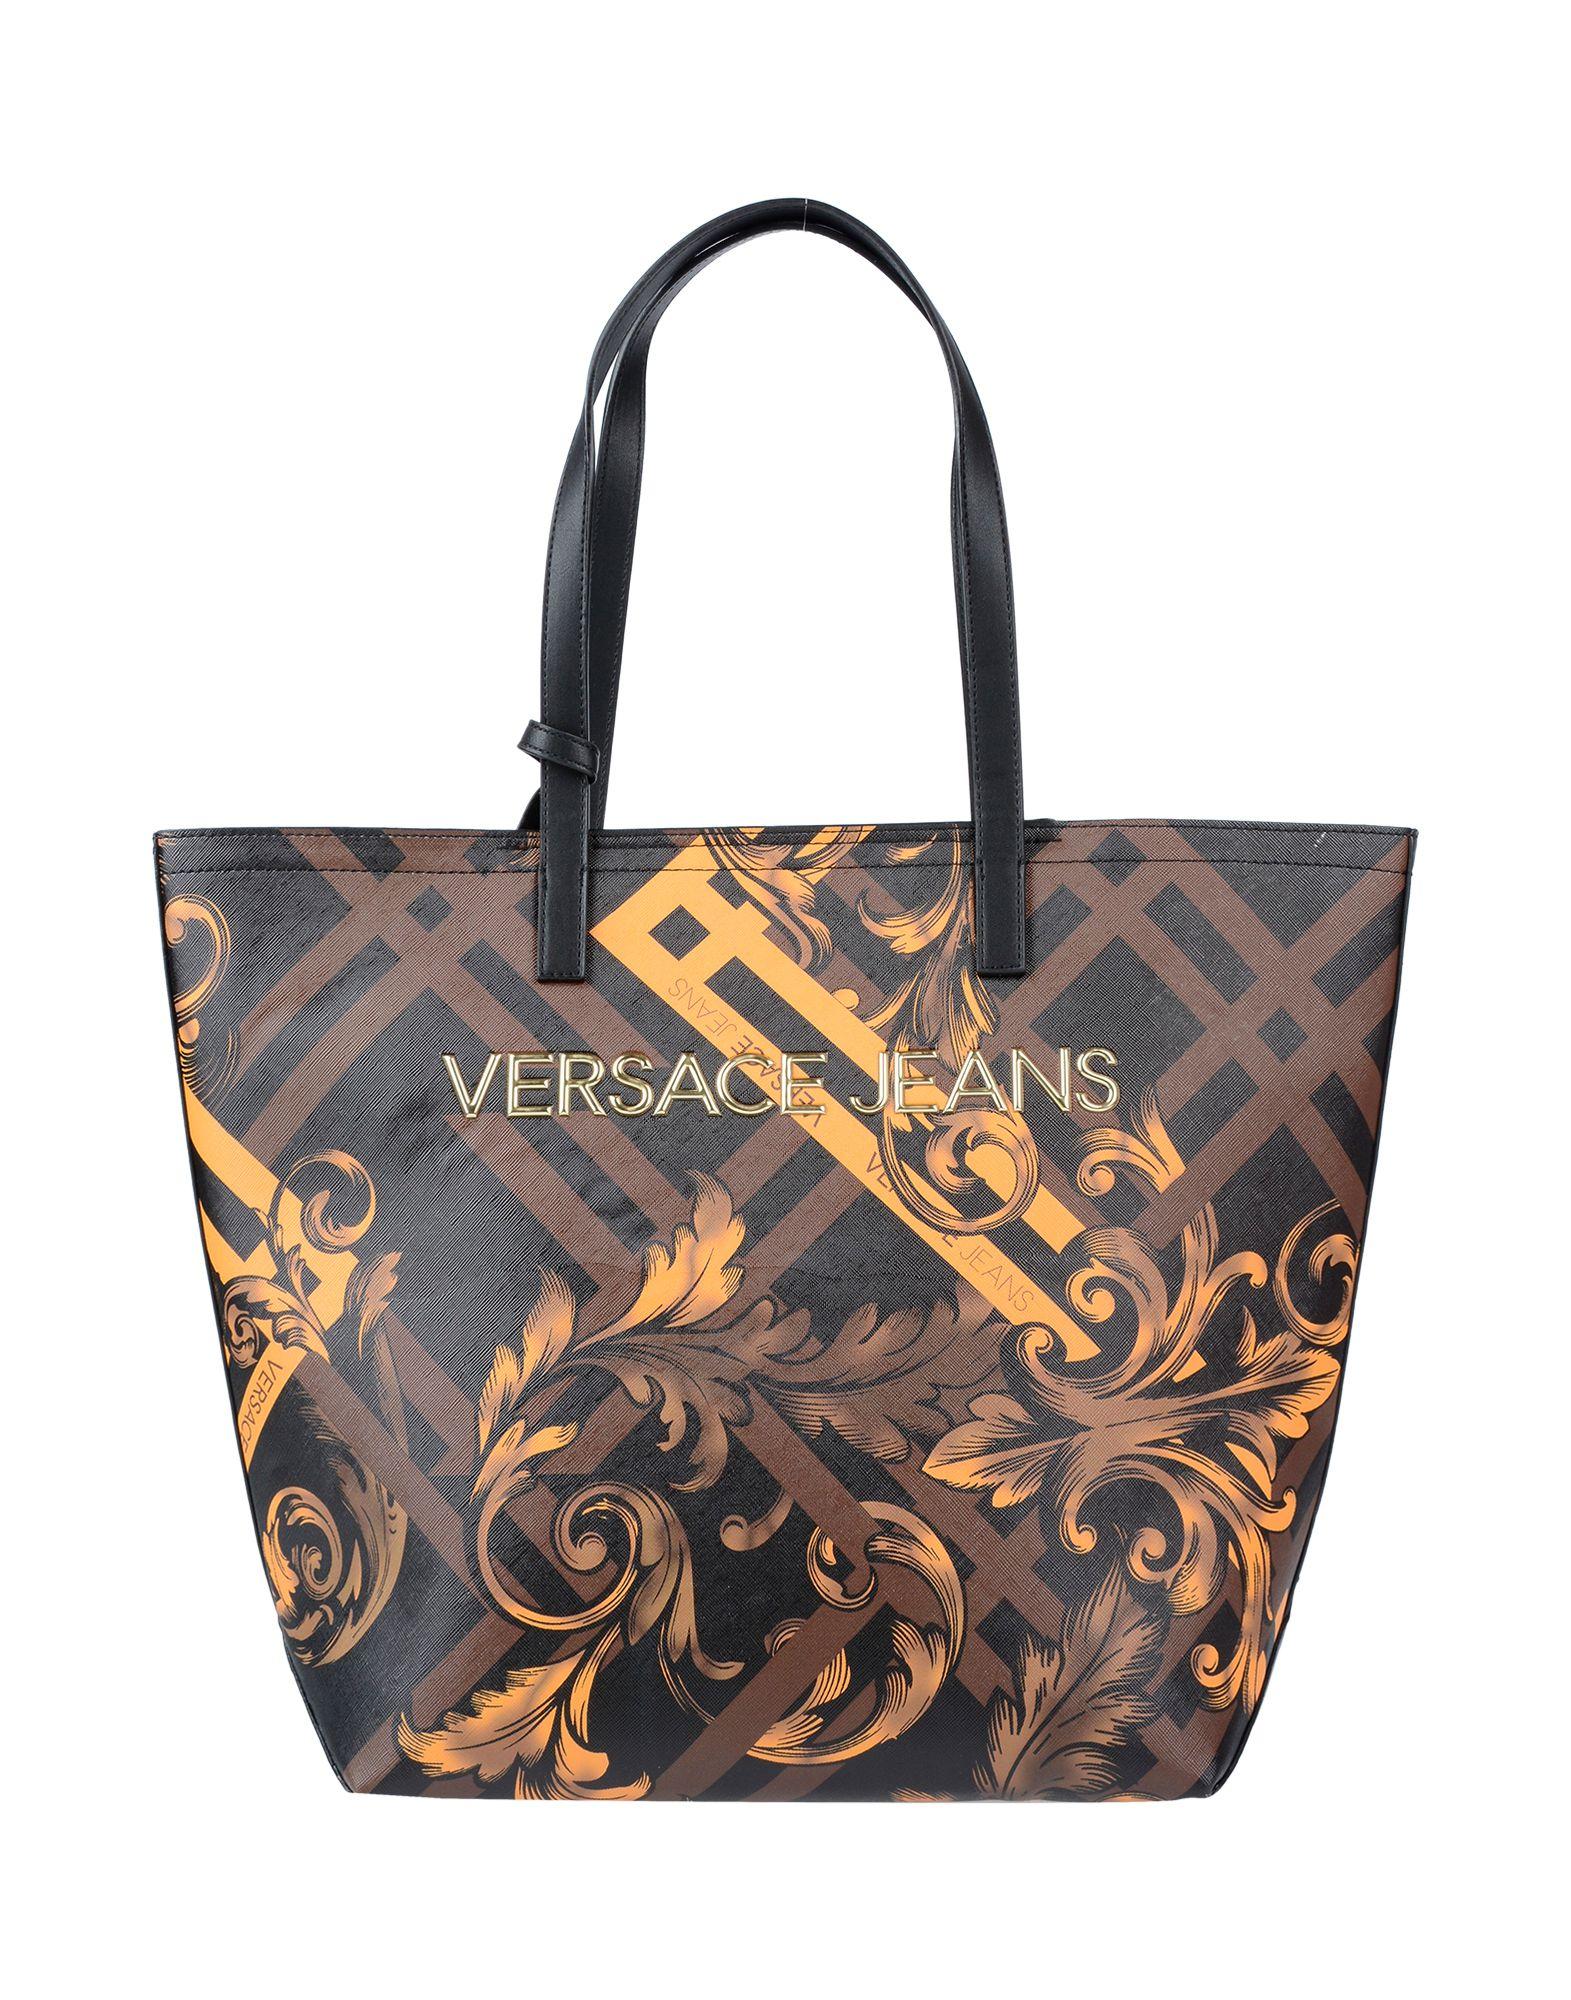 VERSACE JEANS Сумка на руку сумка versace jeans цвет бежевый